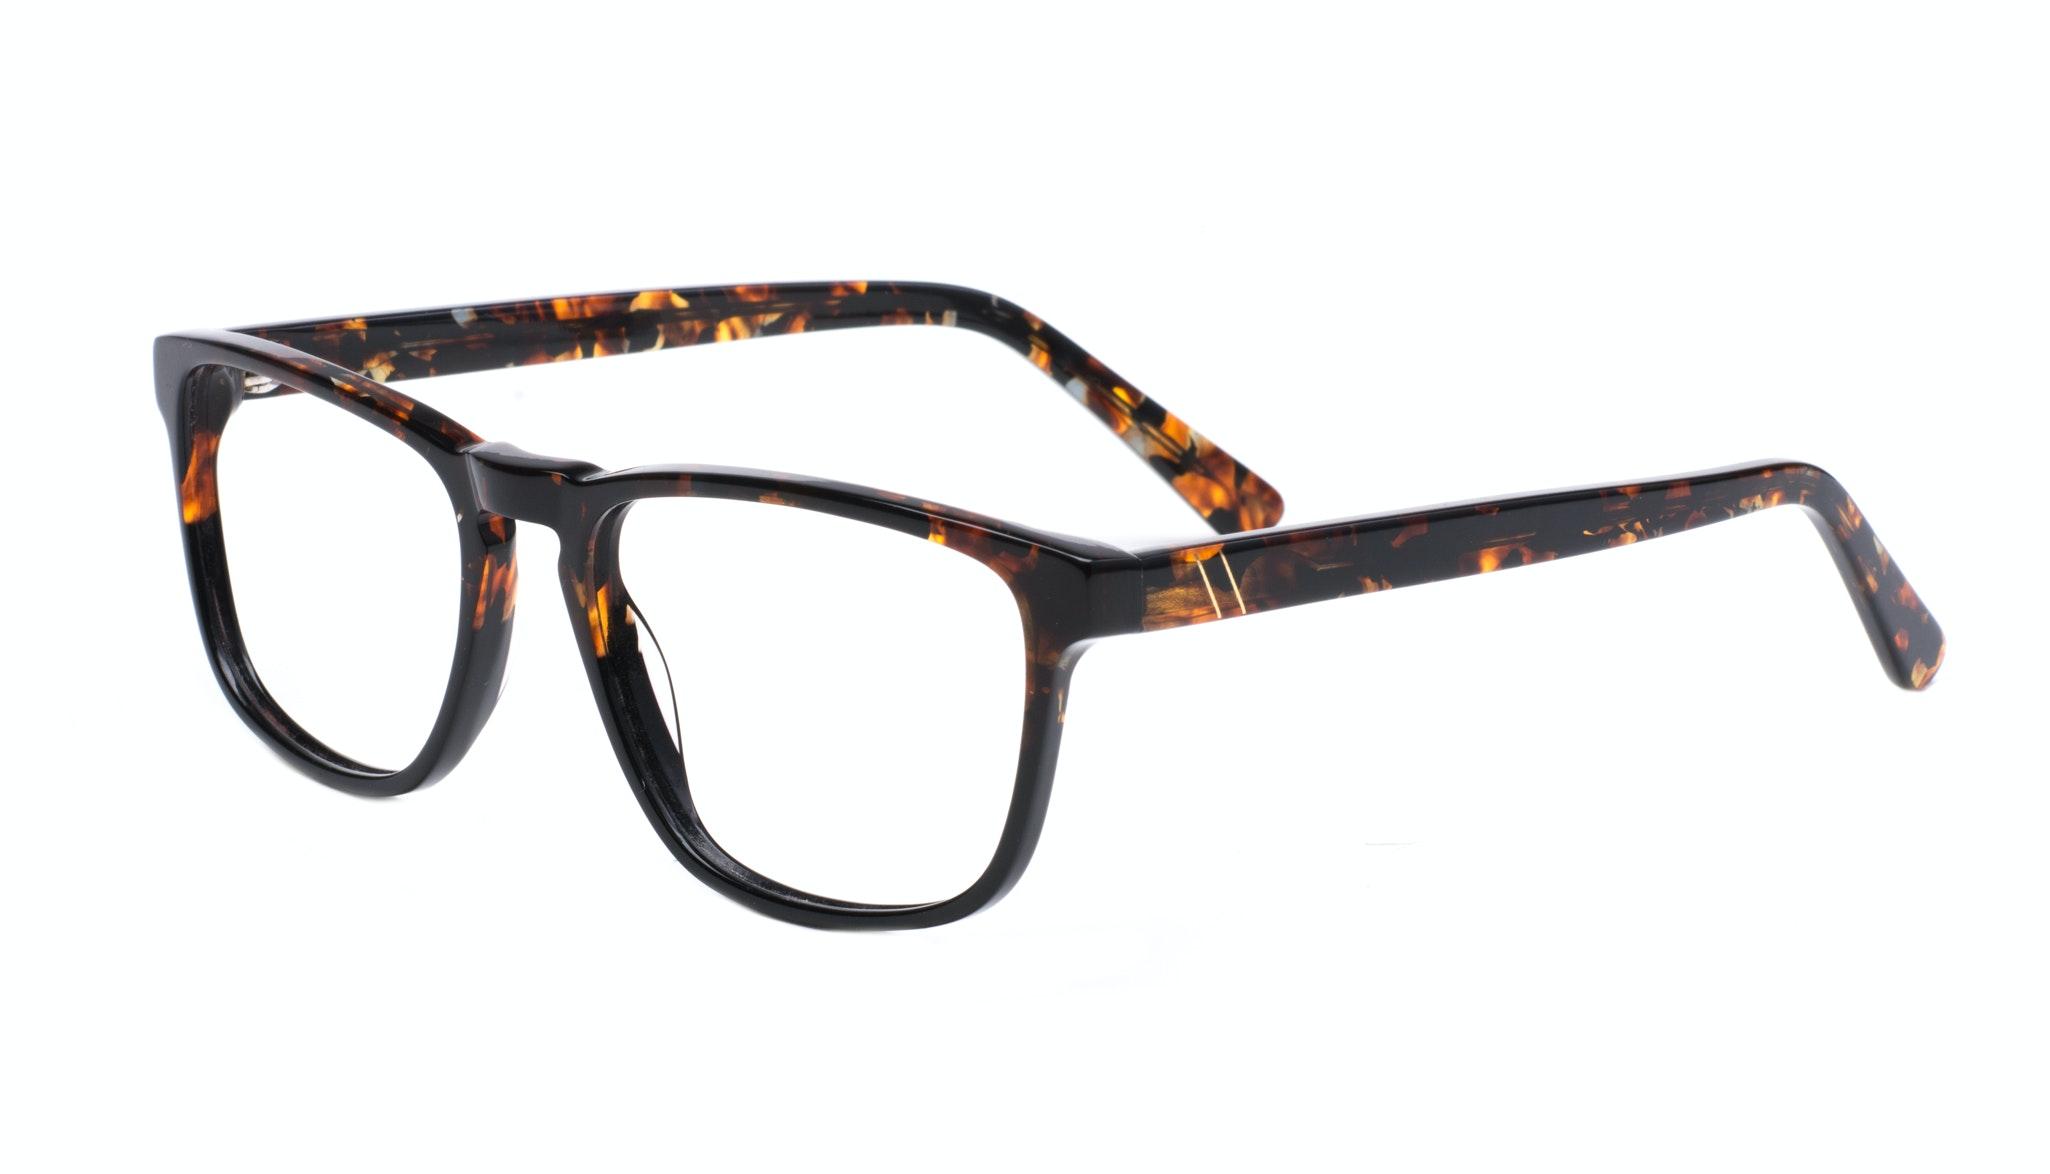 Affordable Fashion Glasses Rectangle Eyeglasses Men Loft Mahogany Black Tilt